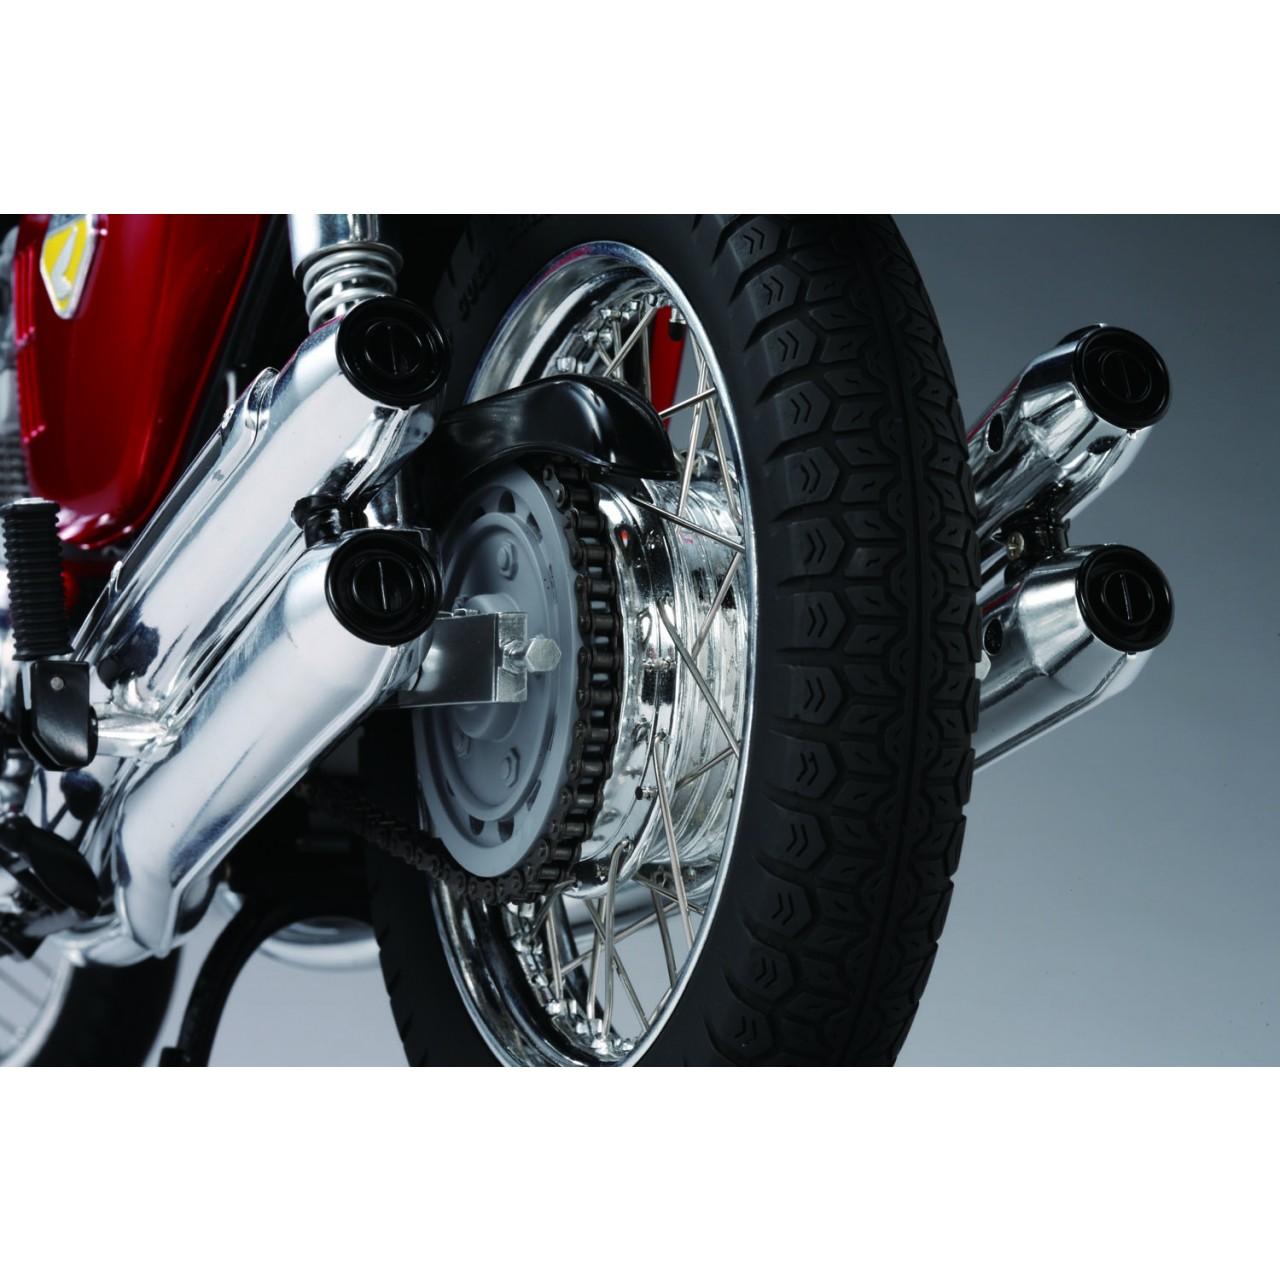 Honda CB750 Motorcycle Model 1:4 Scale Full Kit   ModelSpace